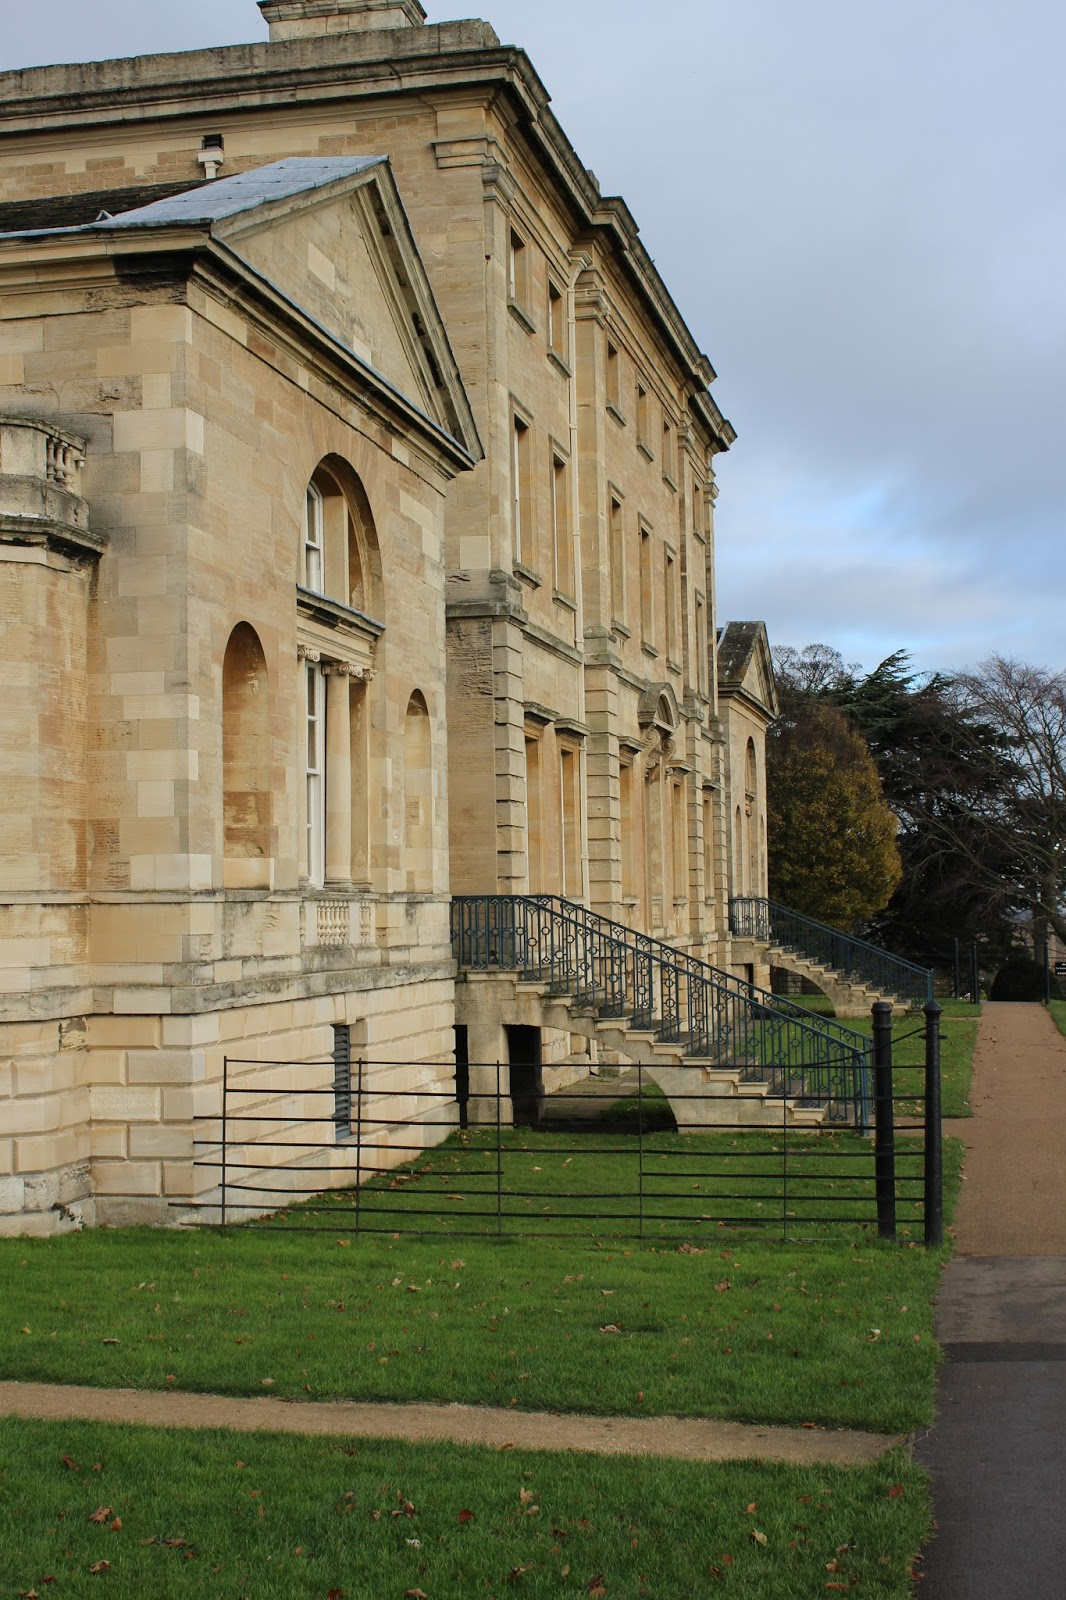 Cusworth Hall, Doncaster